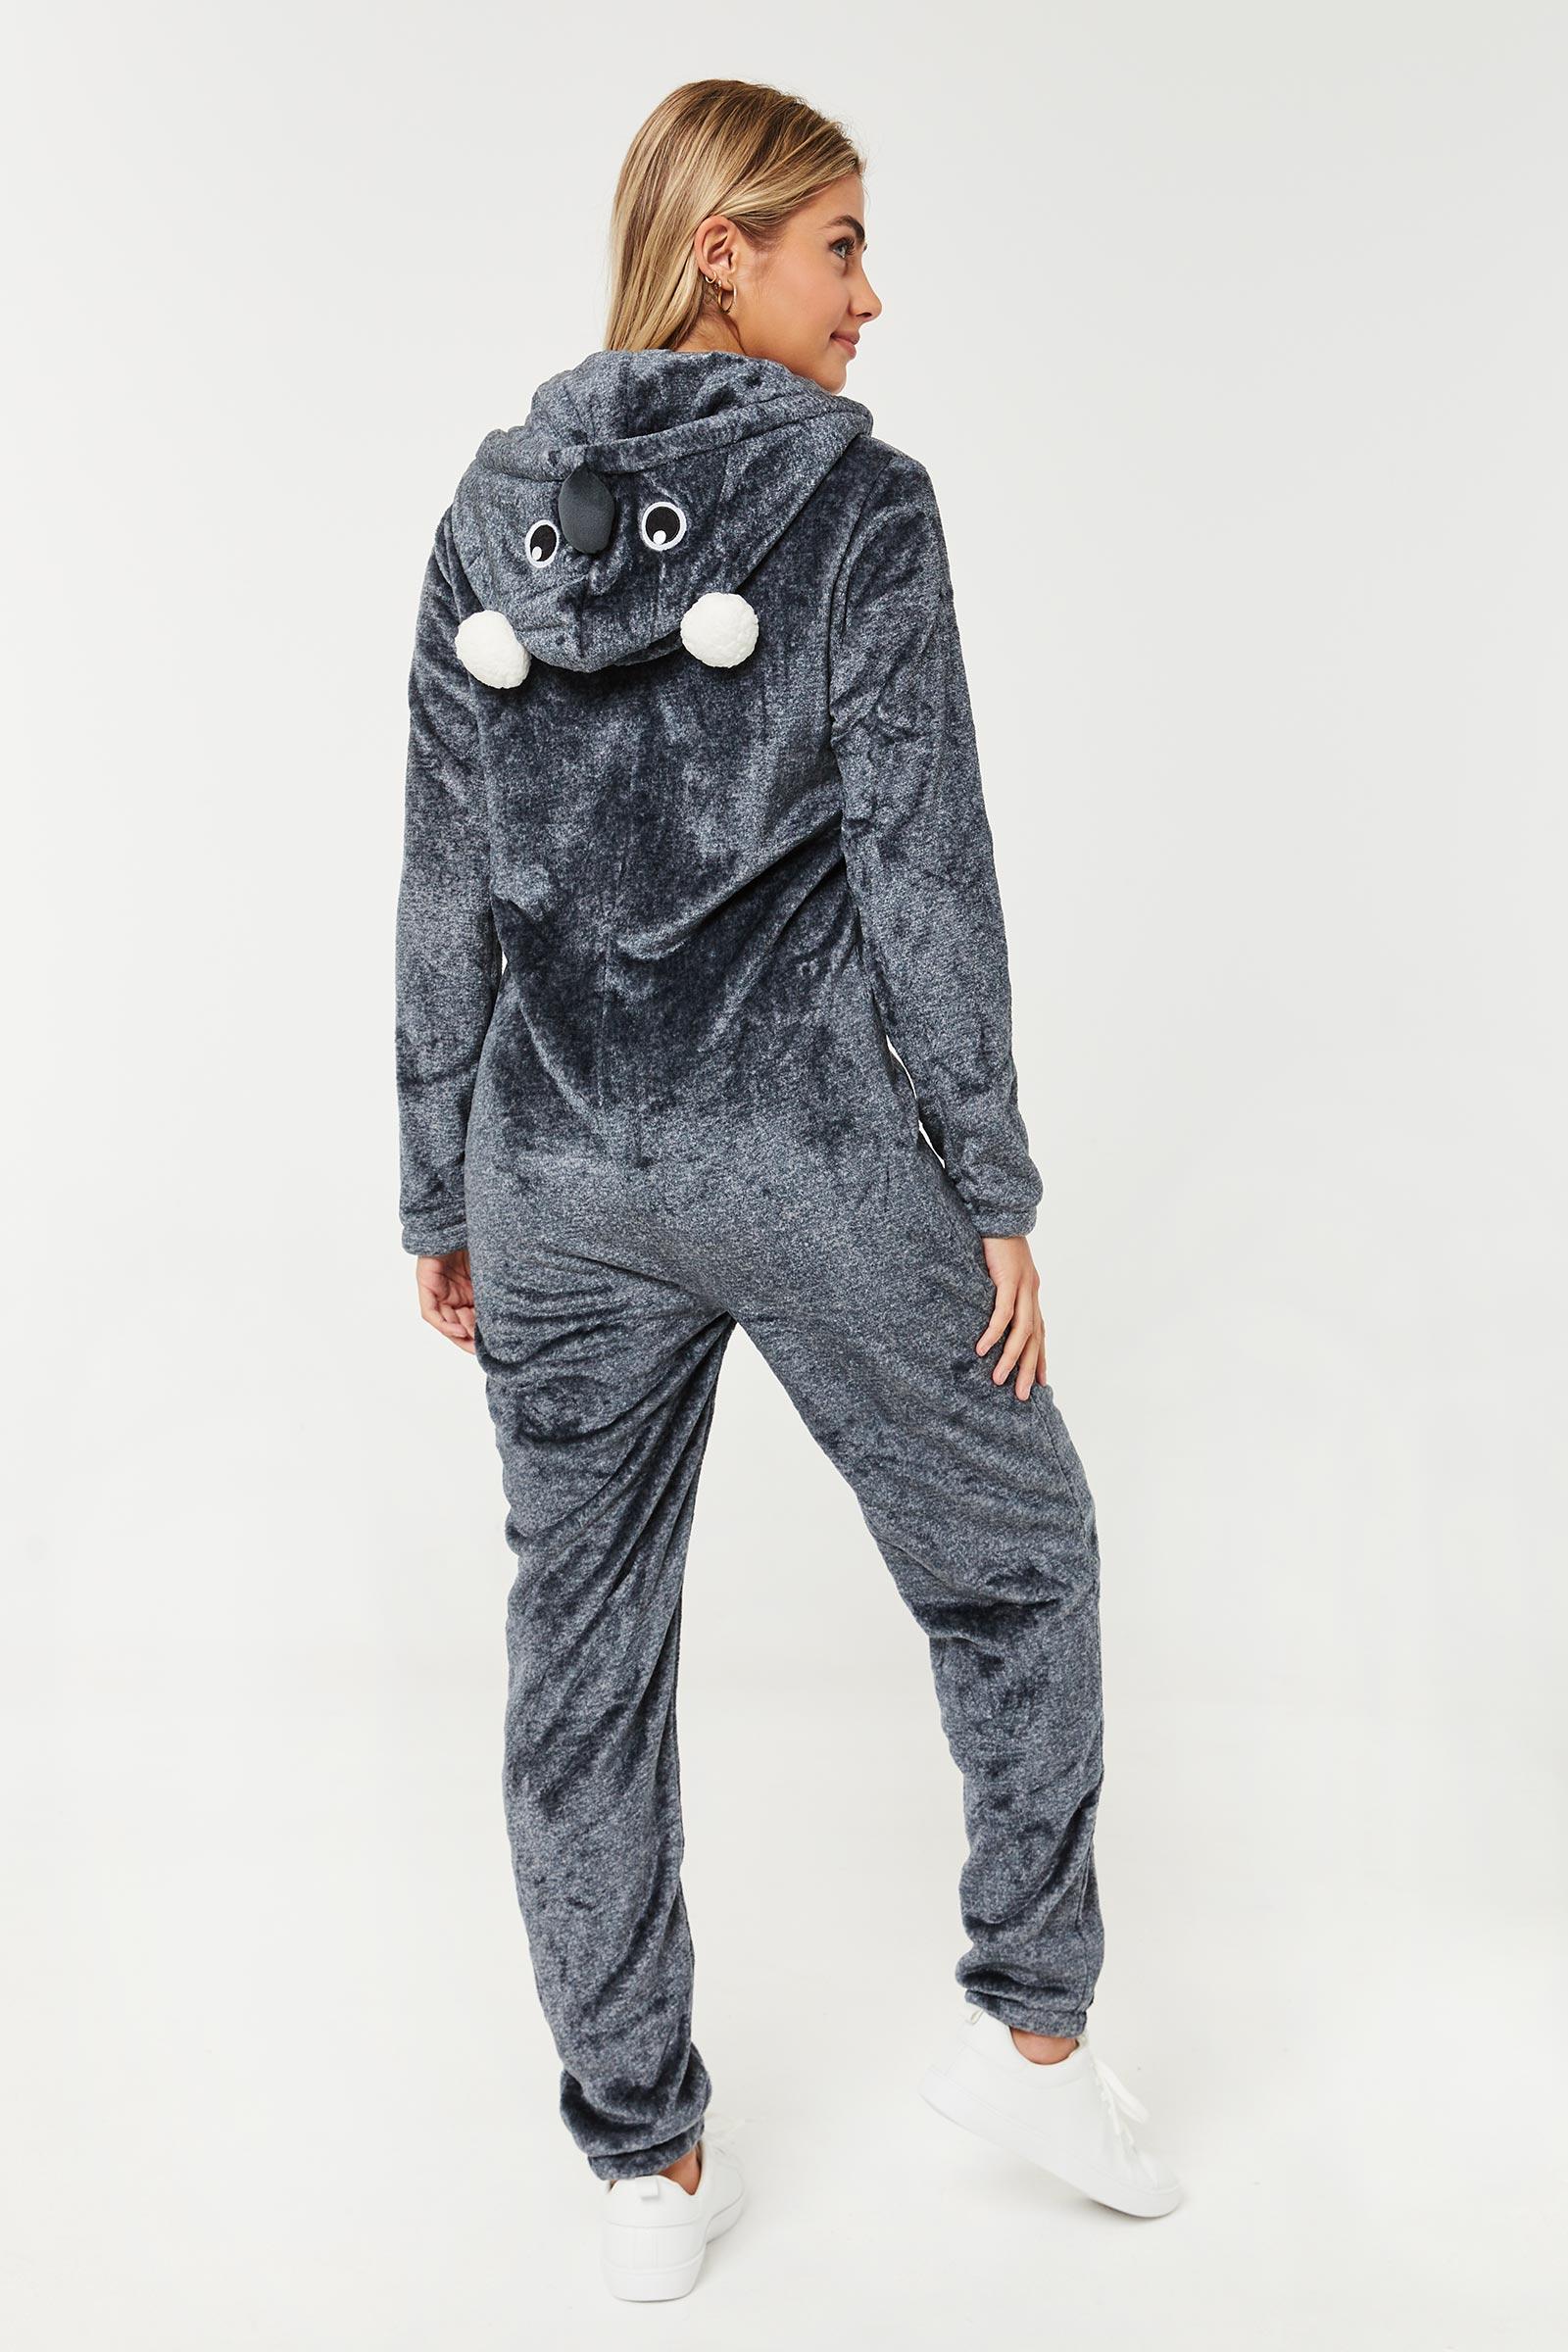 Koala Onesie Costume